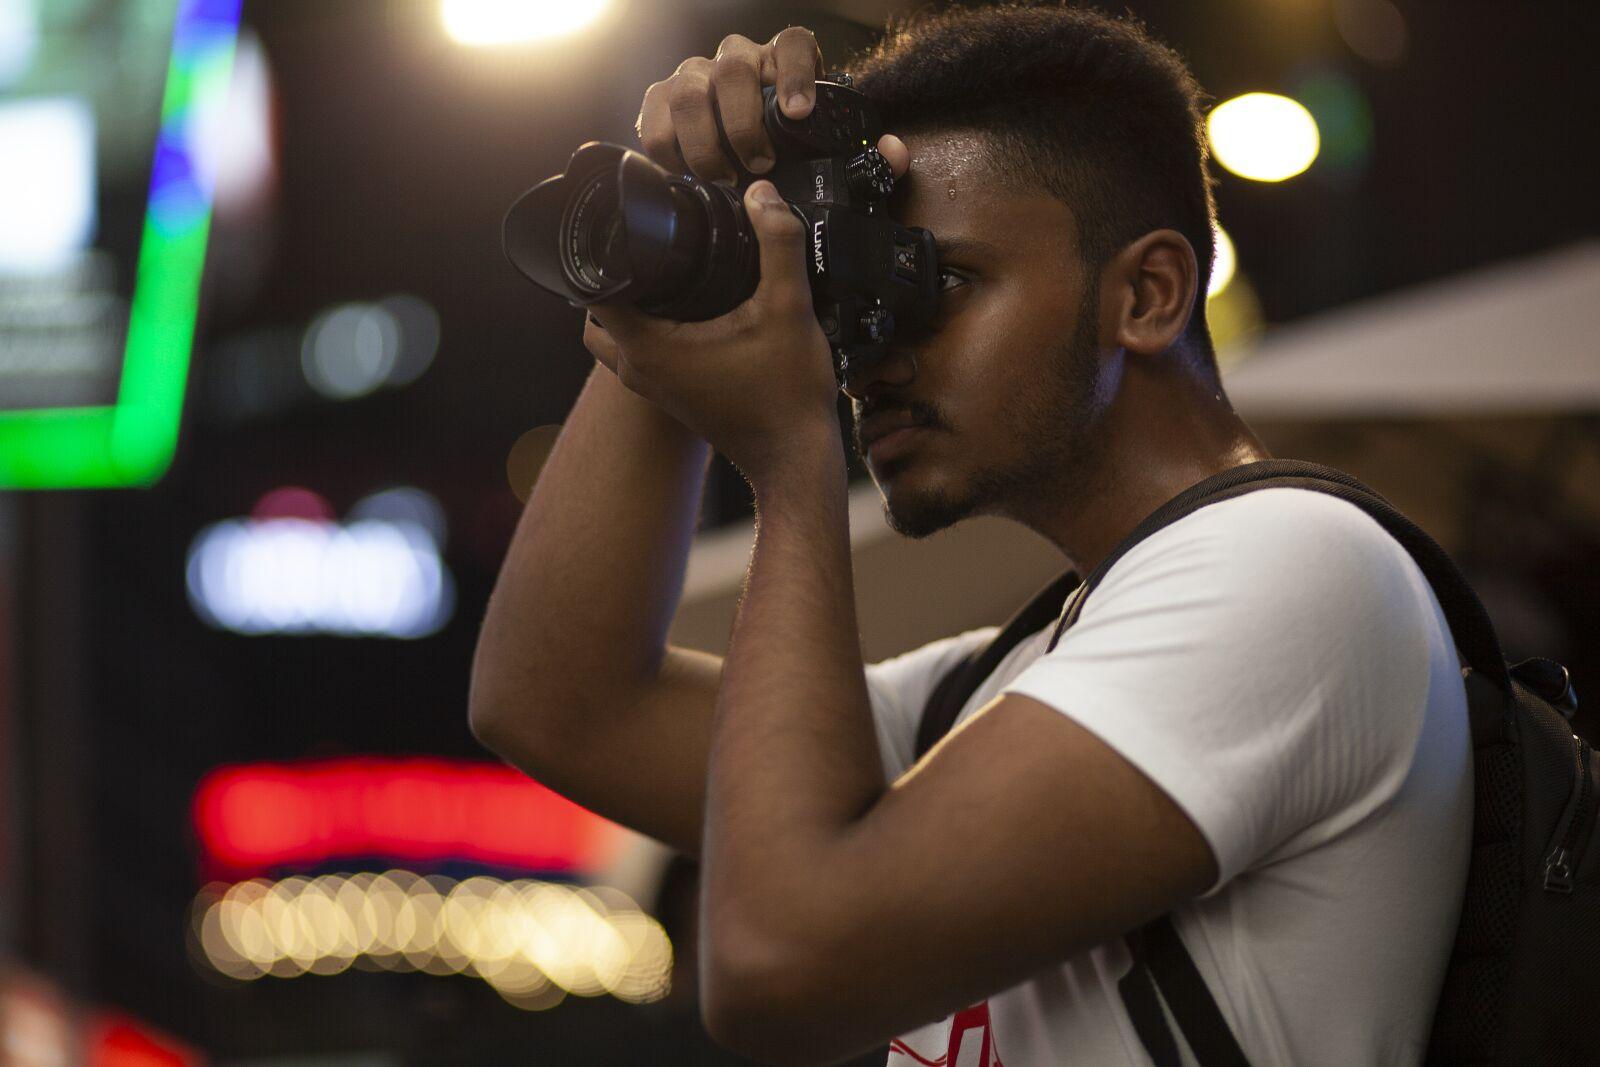 photographer, photography, camera